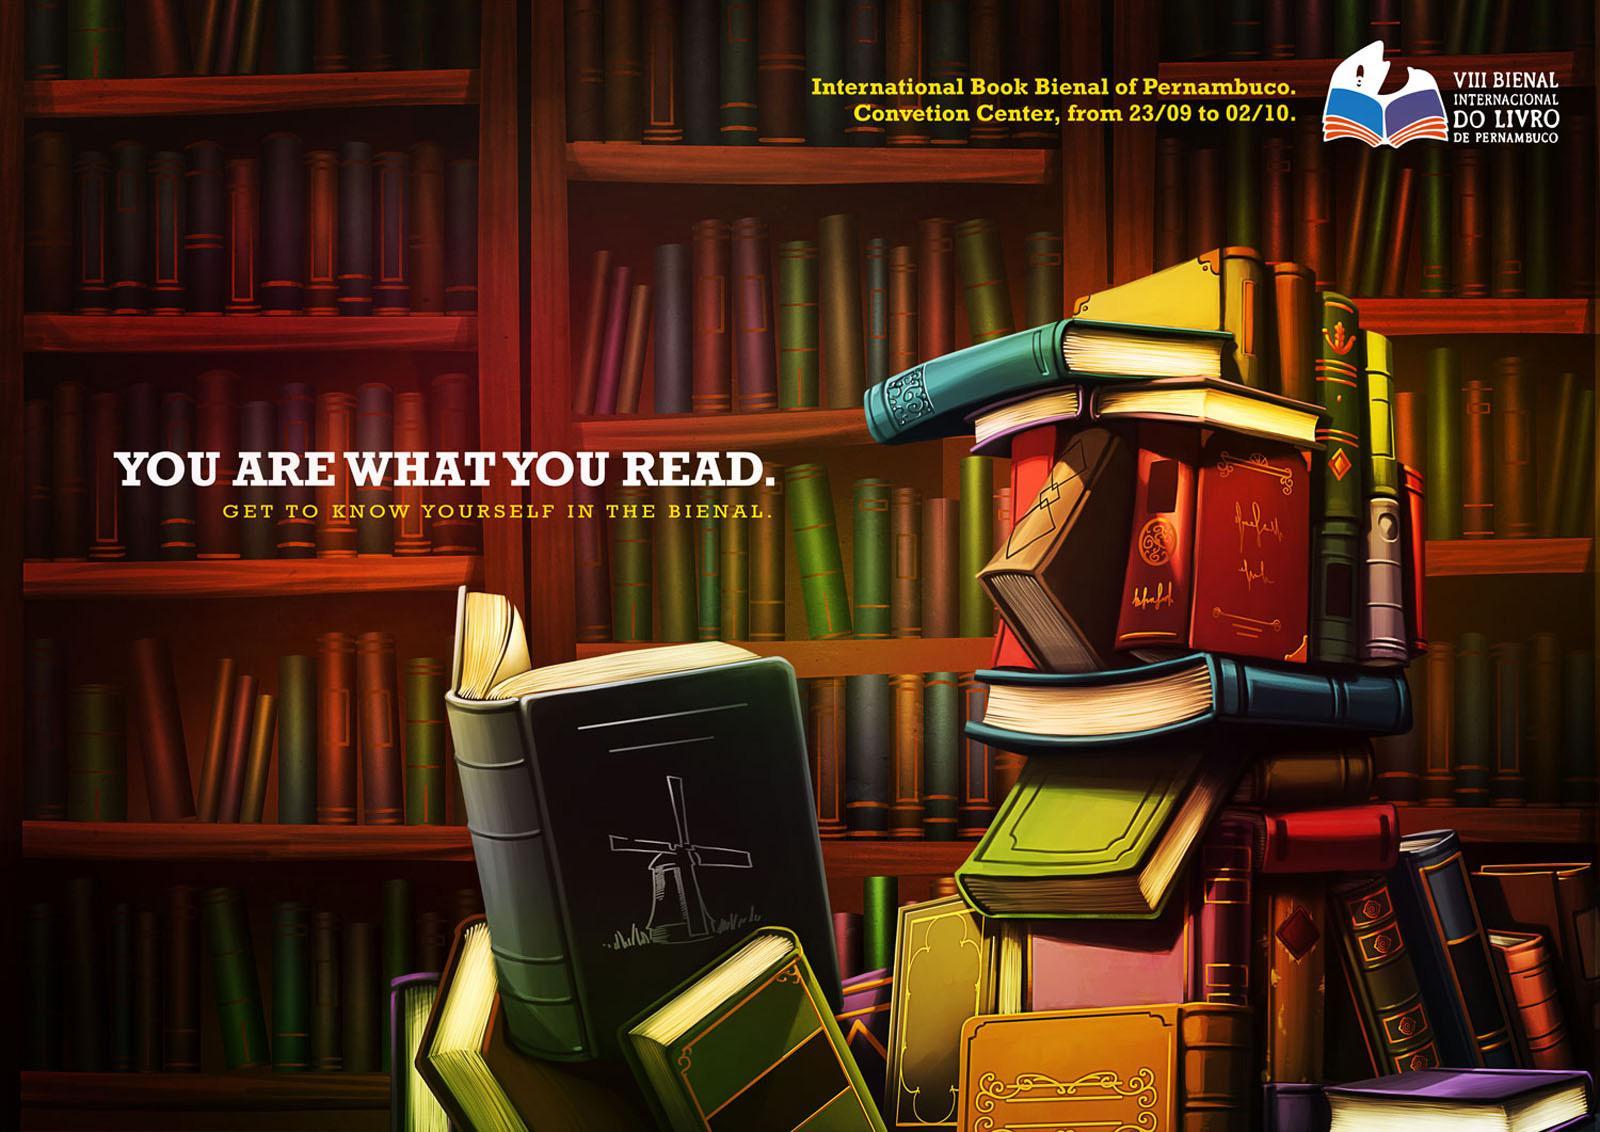 Book Biennial of Pernambuco Print Ad -  You're what you read, 2